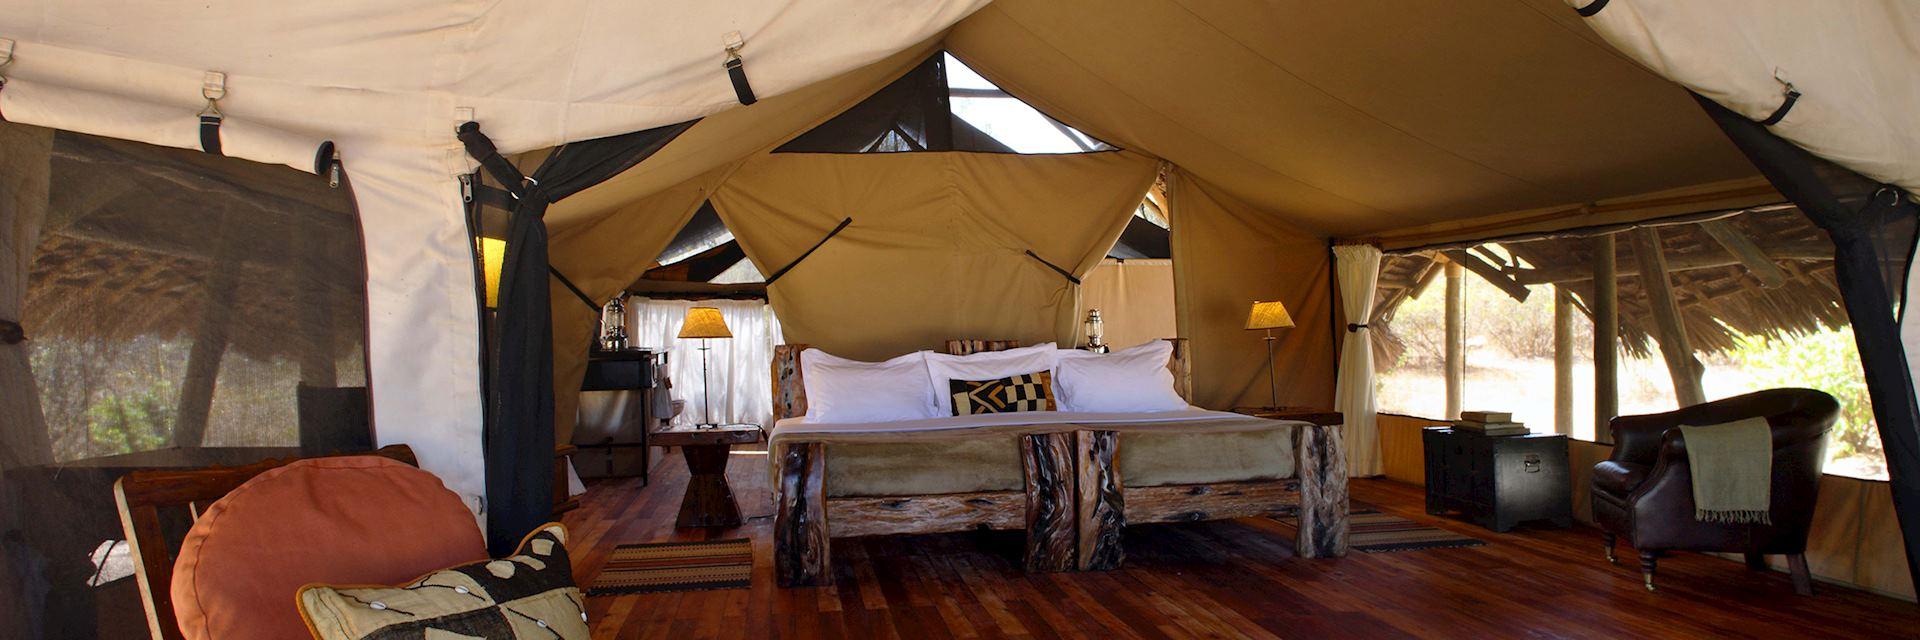 Jongomero Camp, Tanzania